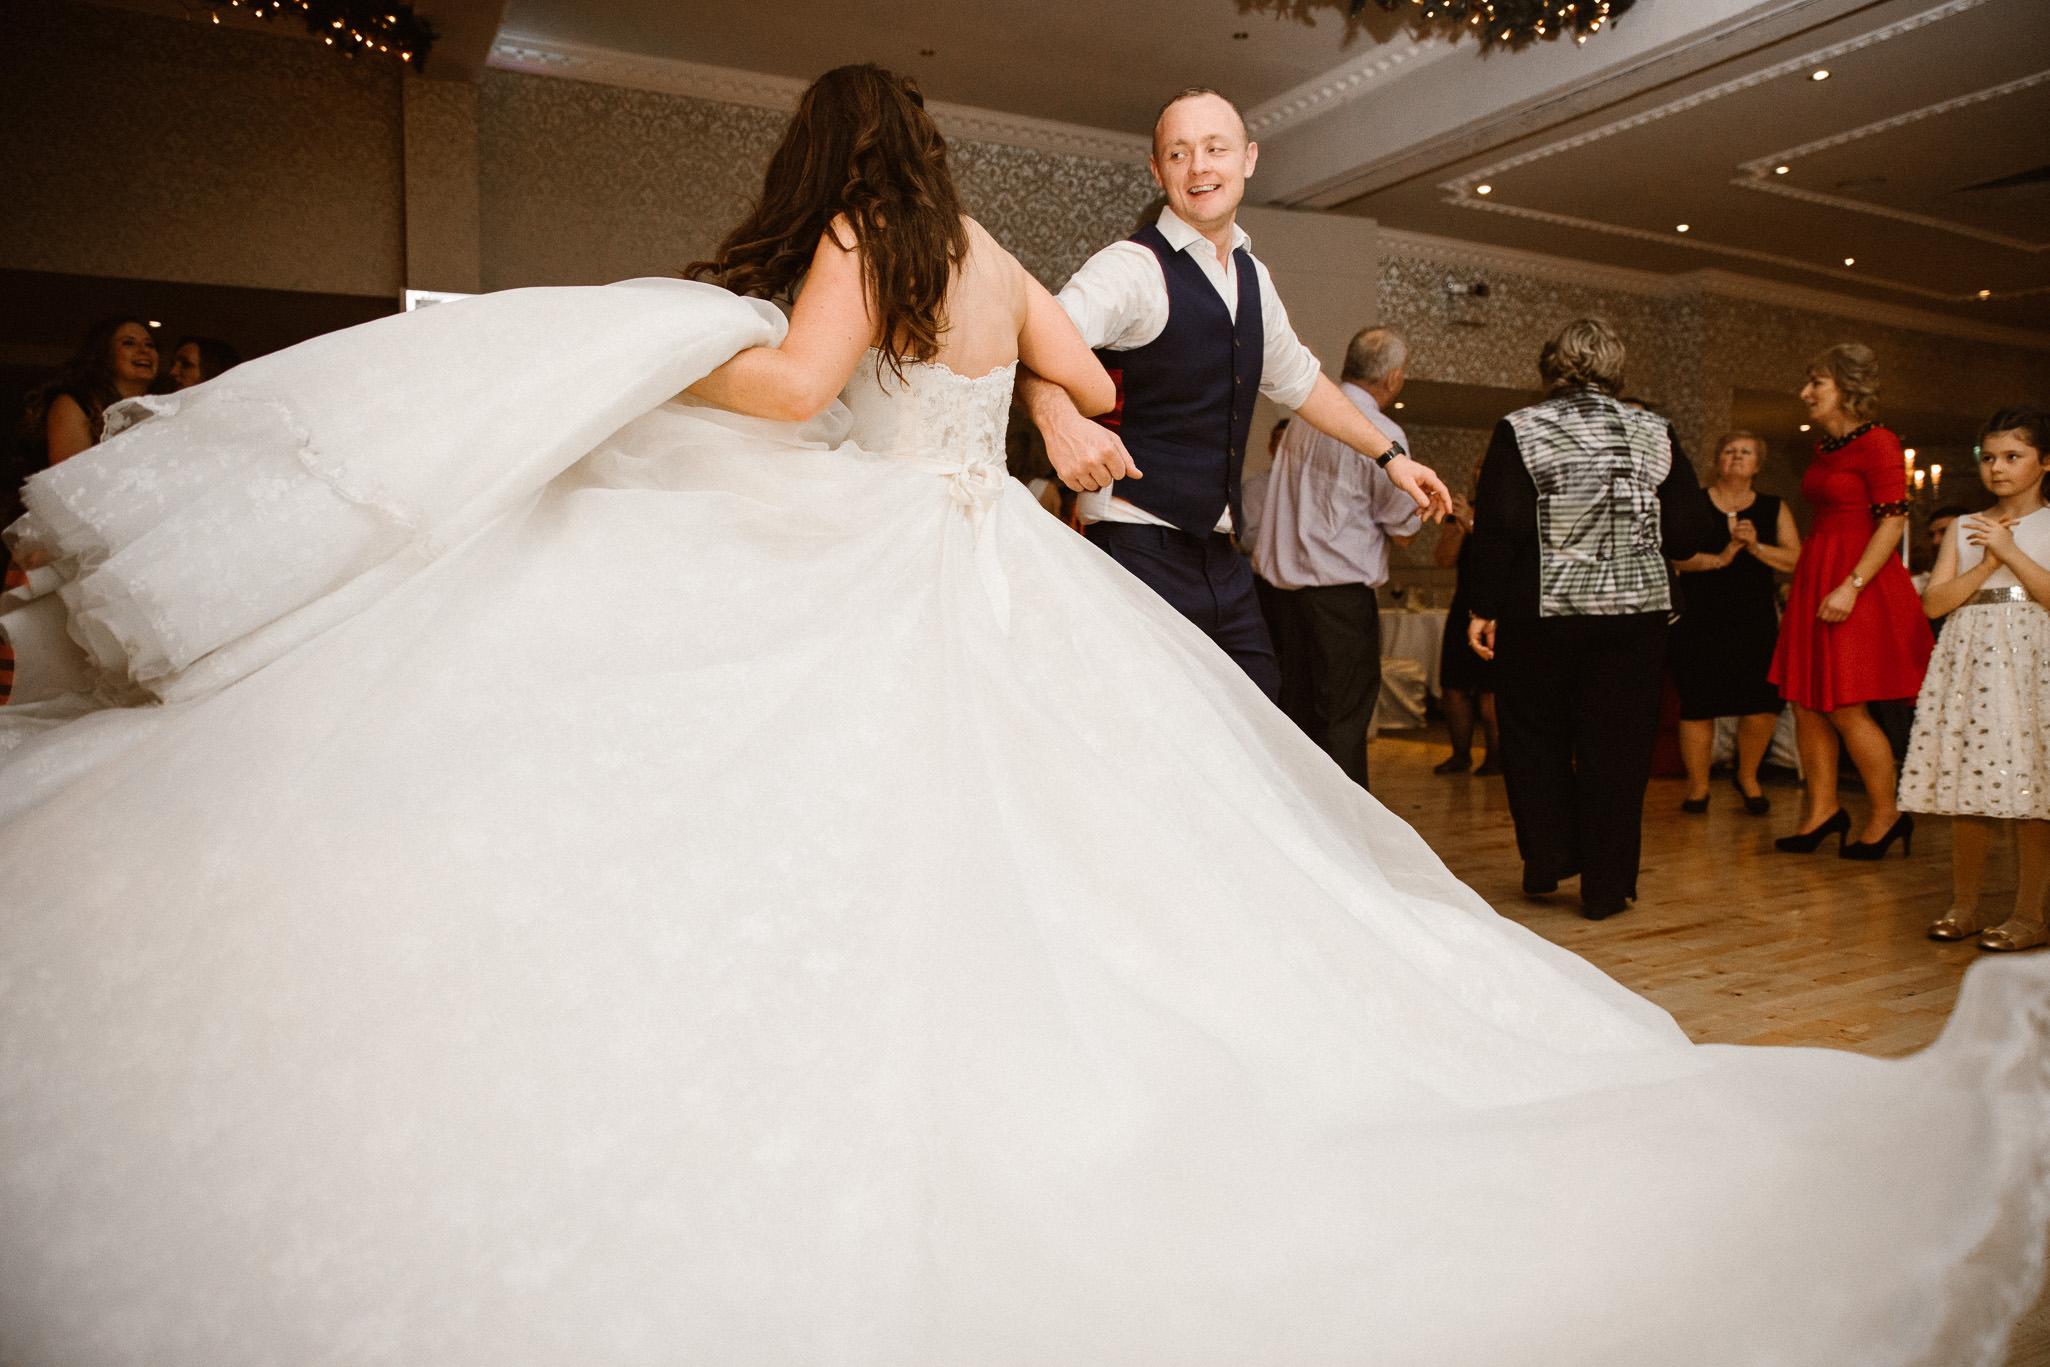 clairebyrnephotography-wedding-night-sparklers-new-years-eve-denyce-leonard-28.jpg